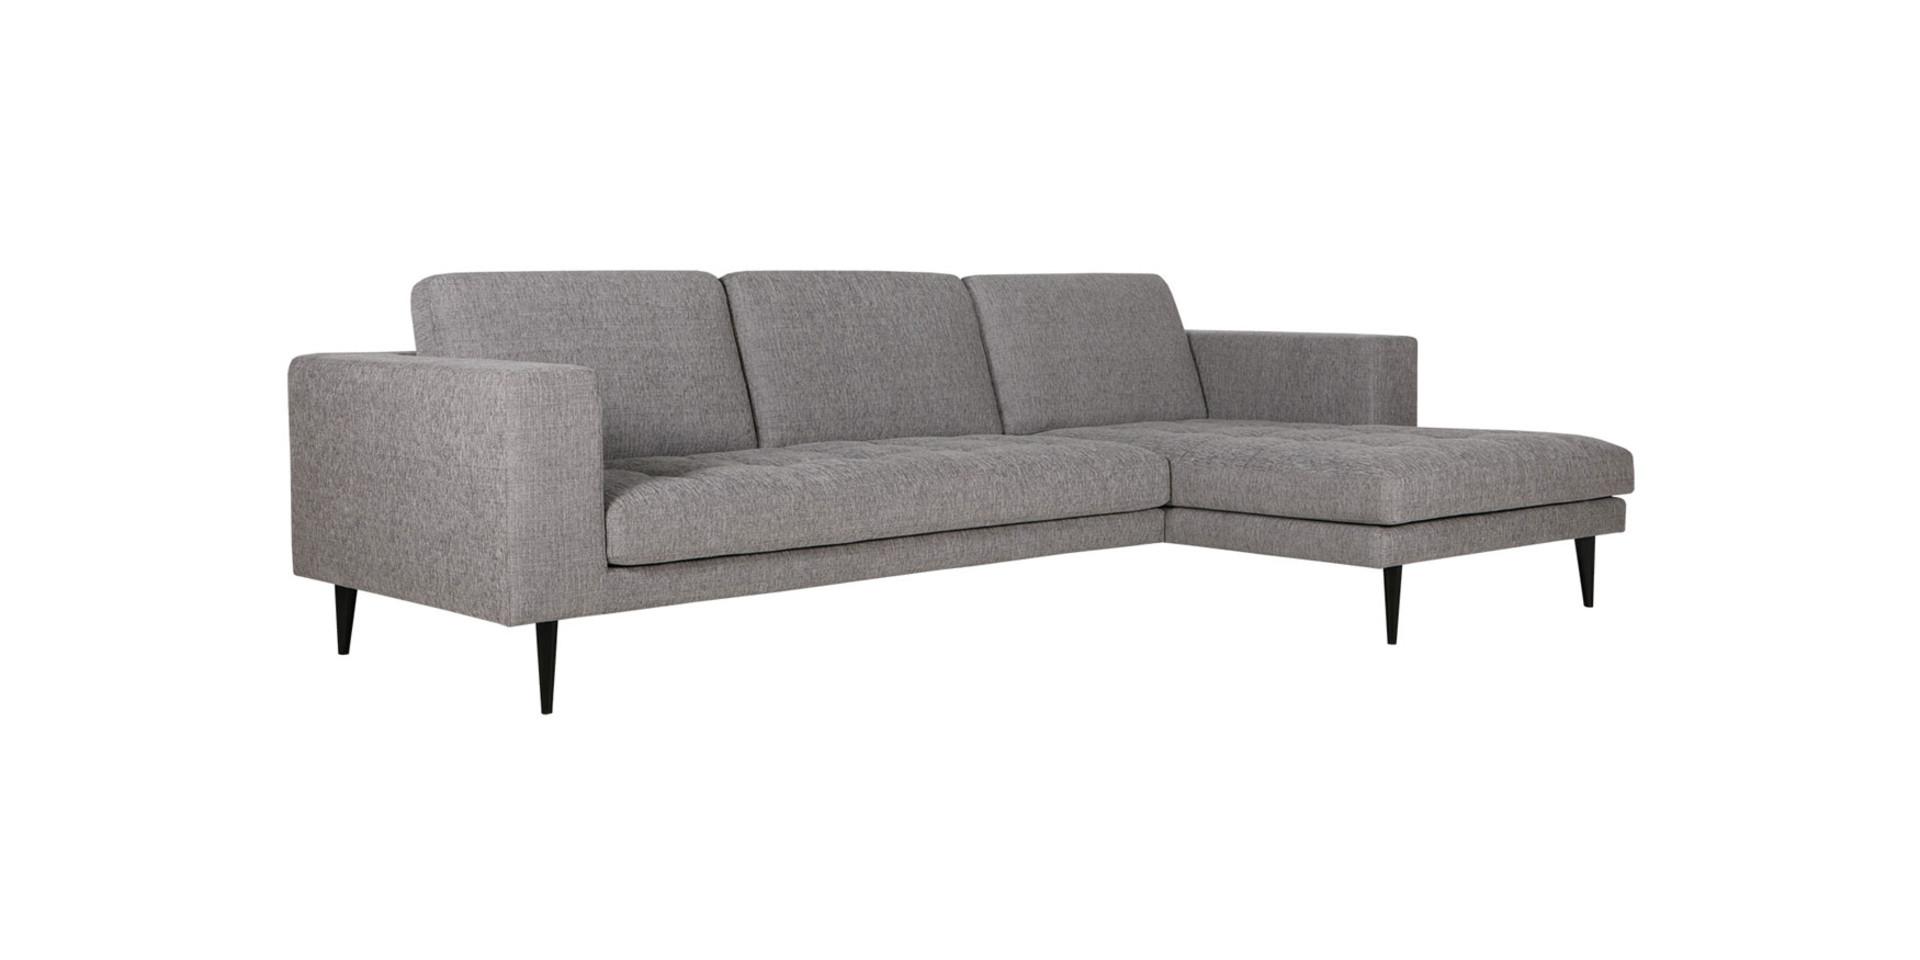 sits-markus-angle-set1_veraam1c9_grey_2